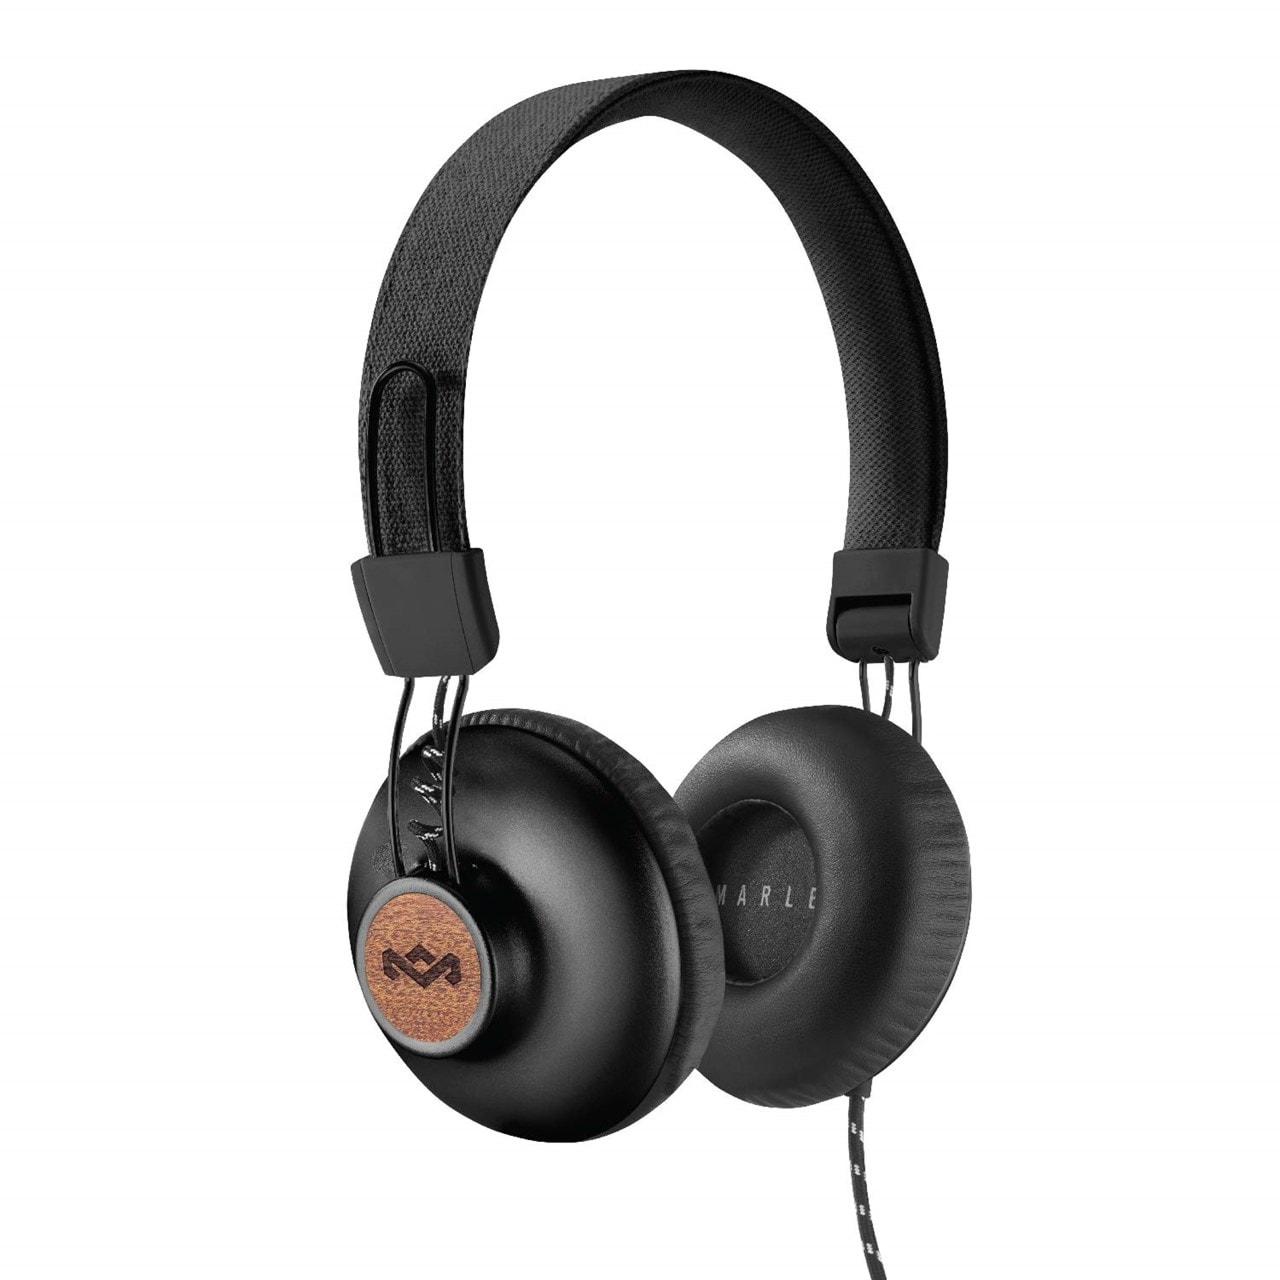 House Of Marley Positive Vibration 2.0 Signature Black Headphones w/Mic - 1